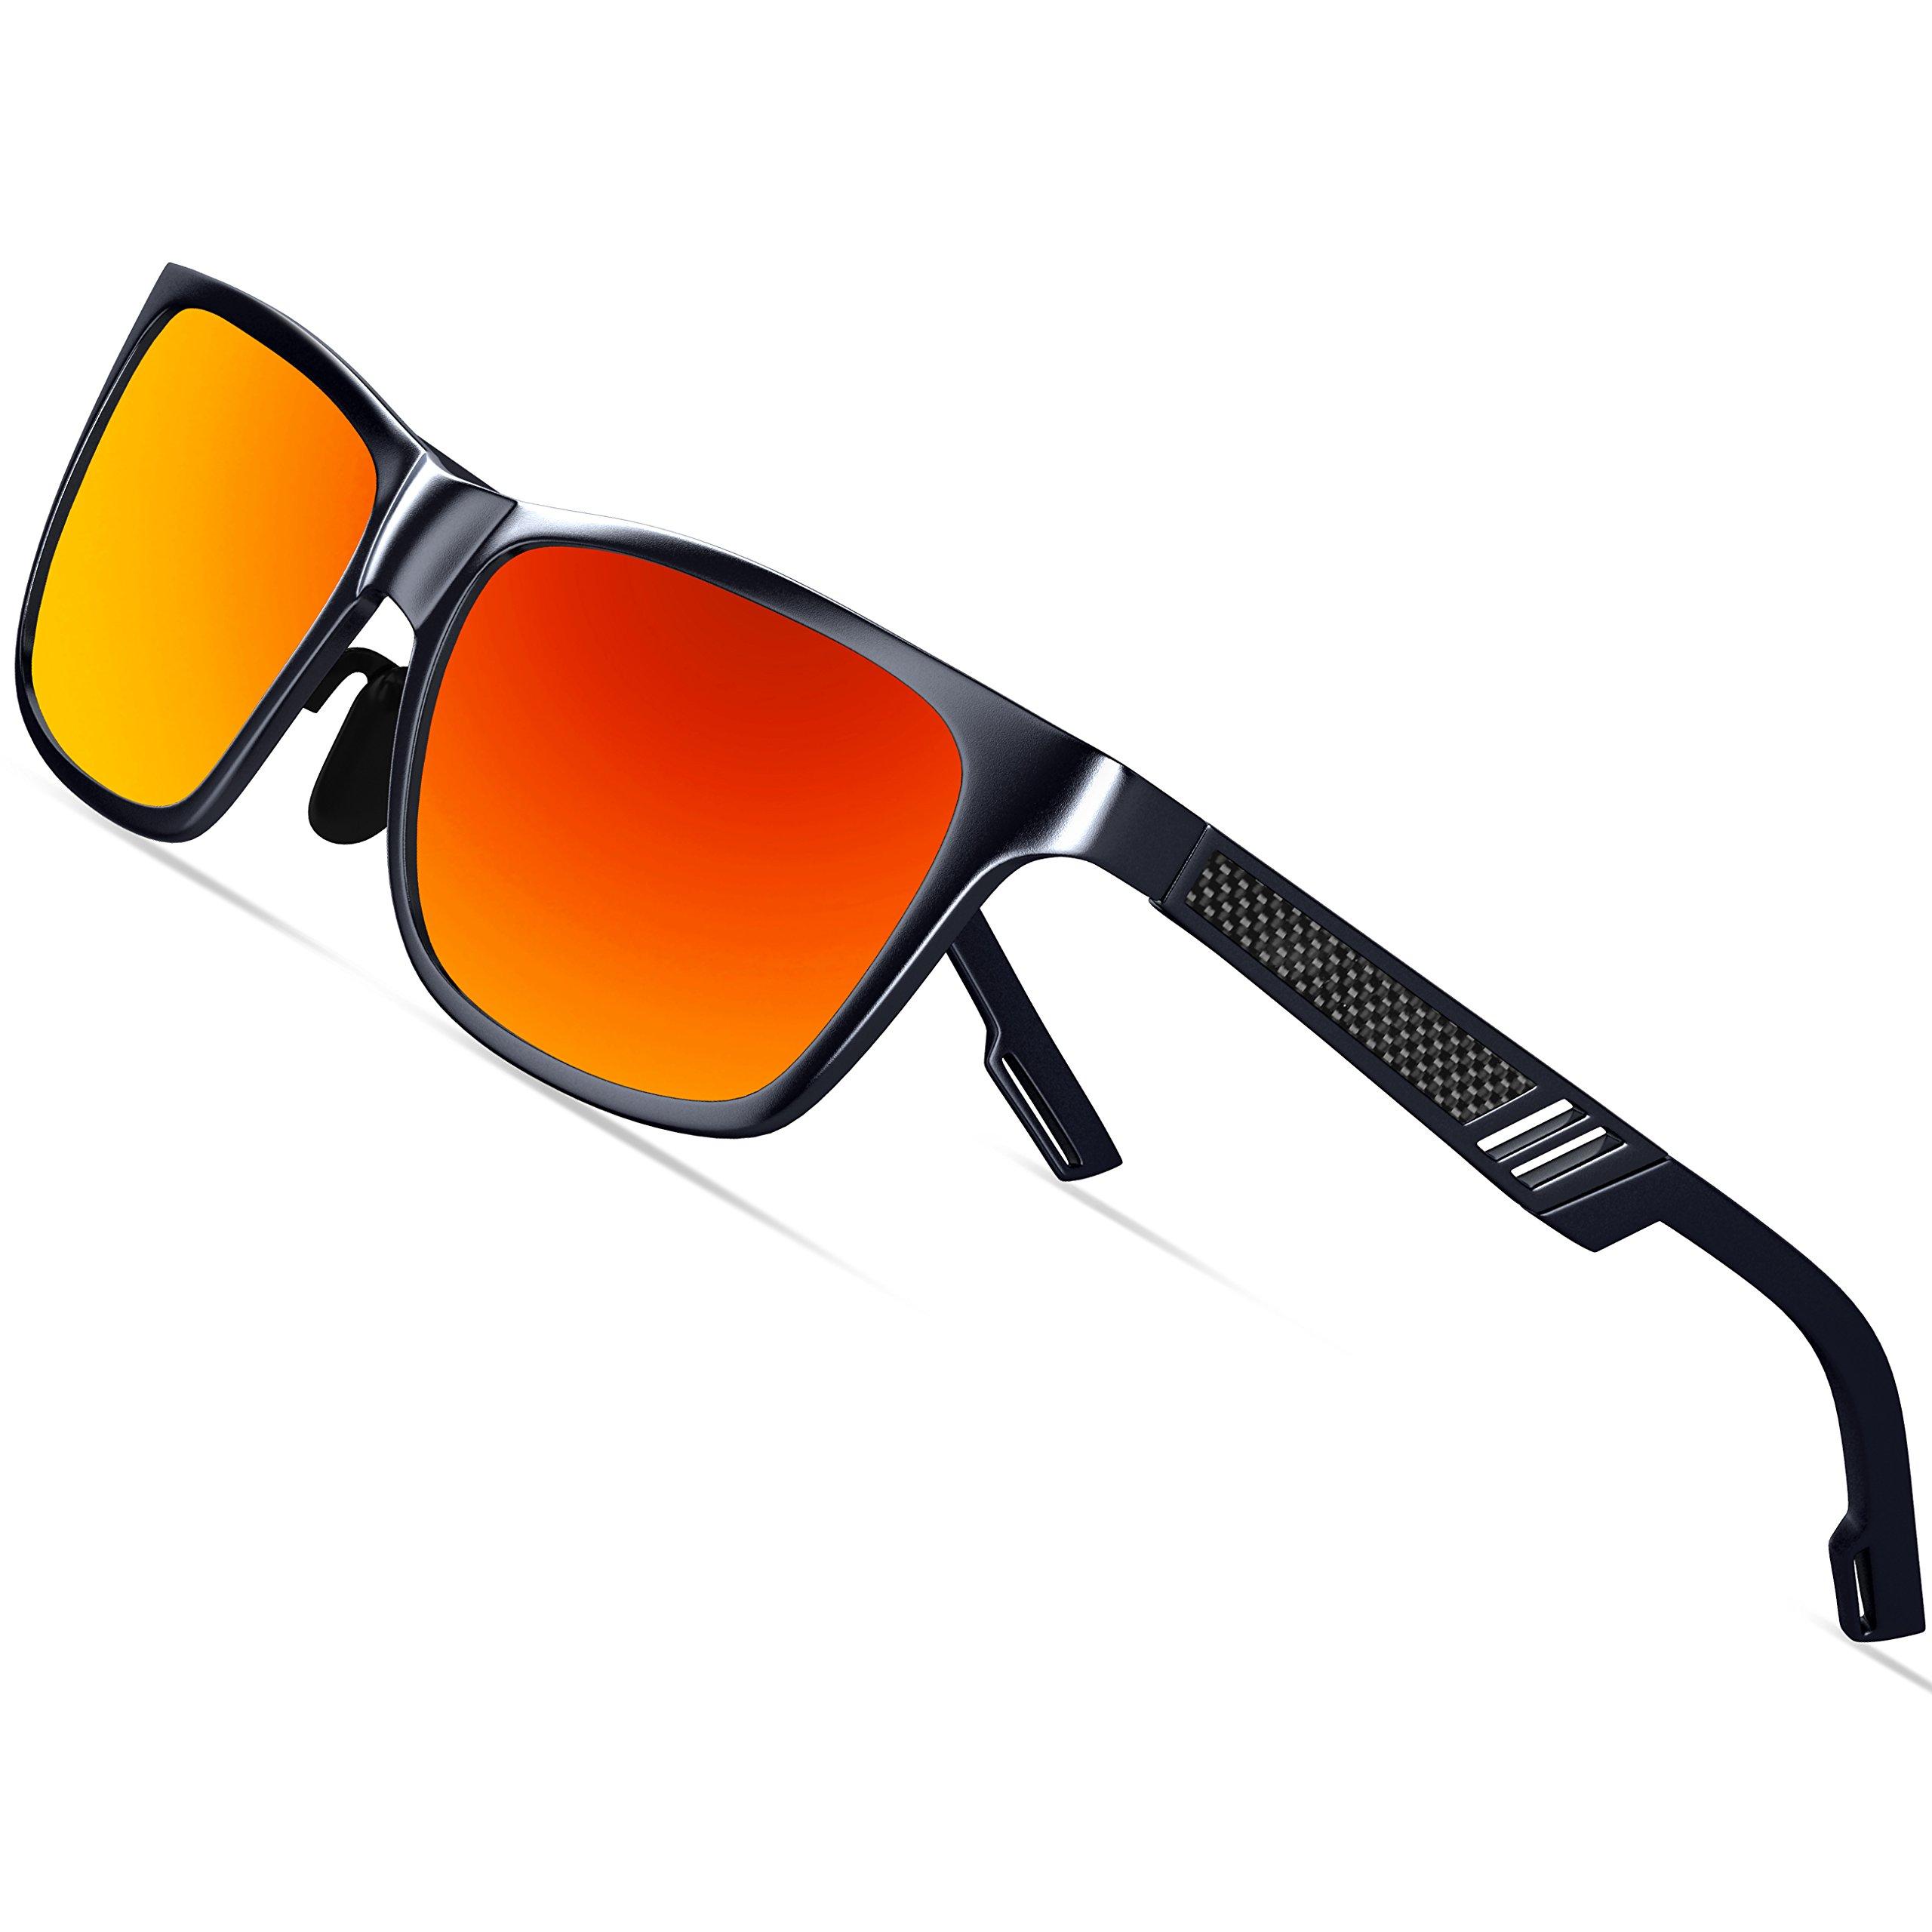 KITHDIA Men's Retro Metal Frame Driving Polarized Wayfarer Sunglasses Al-Mg Metal Frame Ultra Light #6560